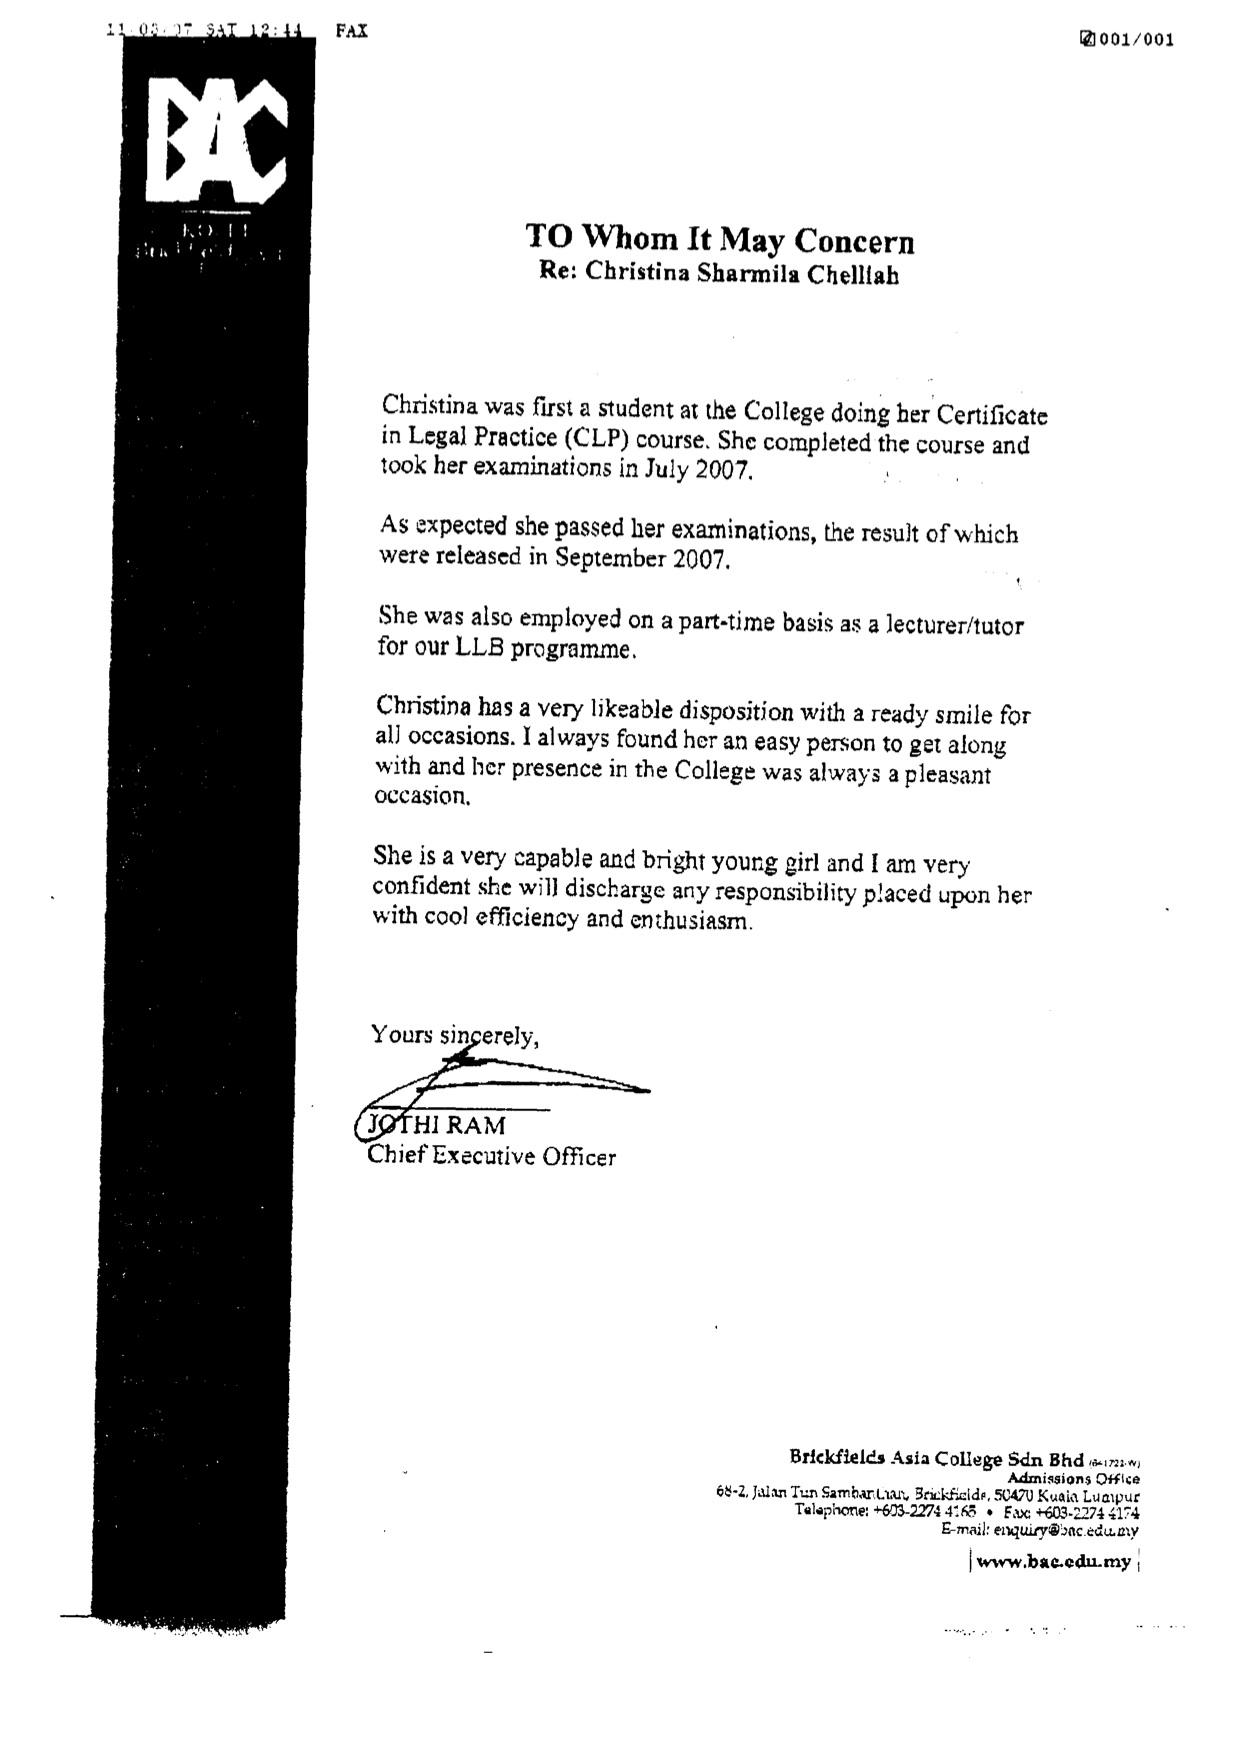 2007 - Teaching - BAC - Jothi Ram Reference Letter.jpg